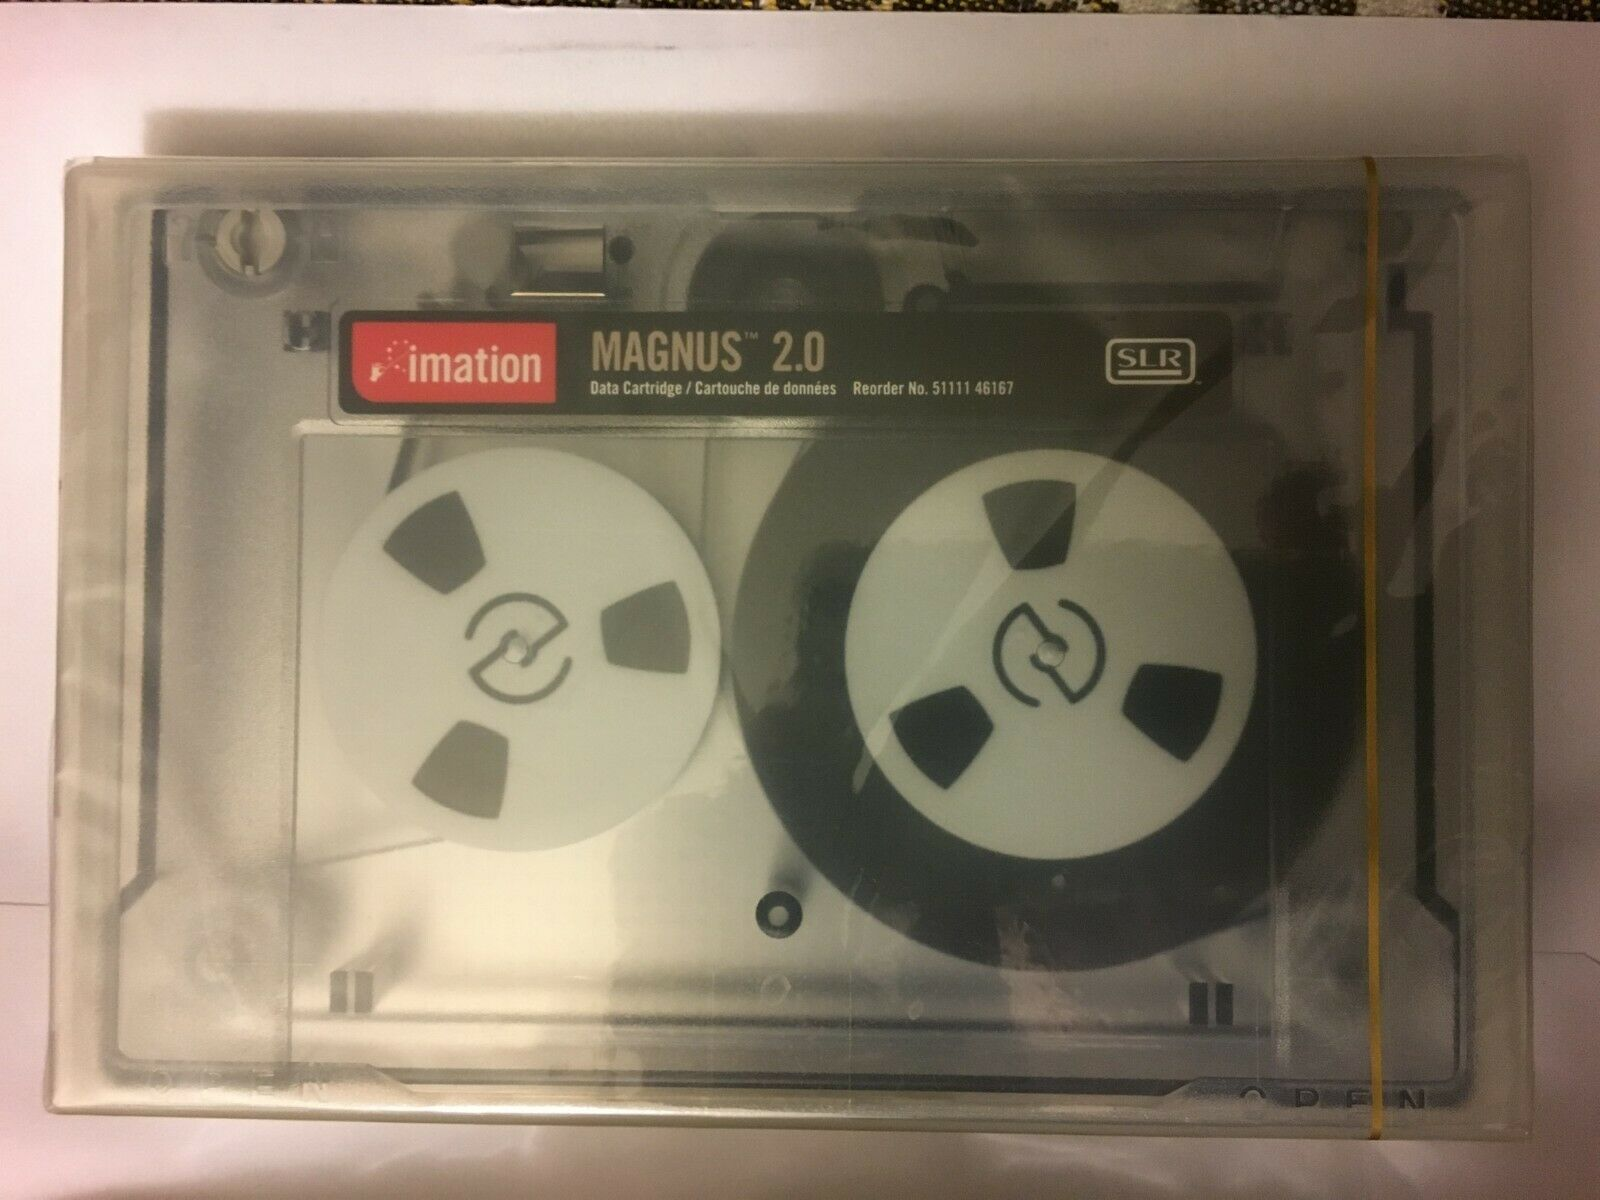 Magnus 2.5 GB Data Cartridge SLR 4 5 GB Imation 46168 Tape